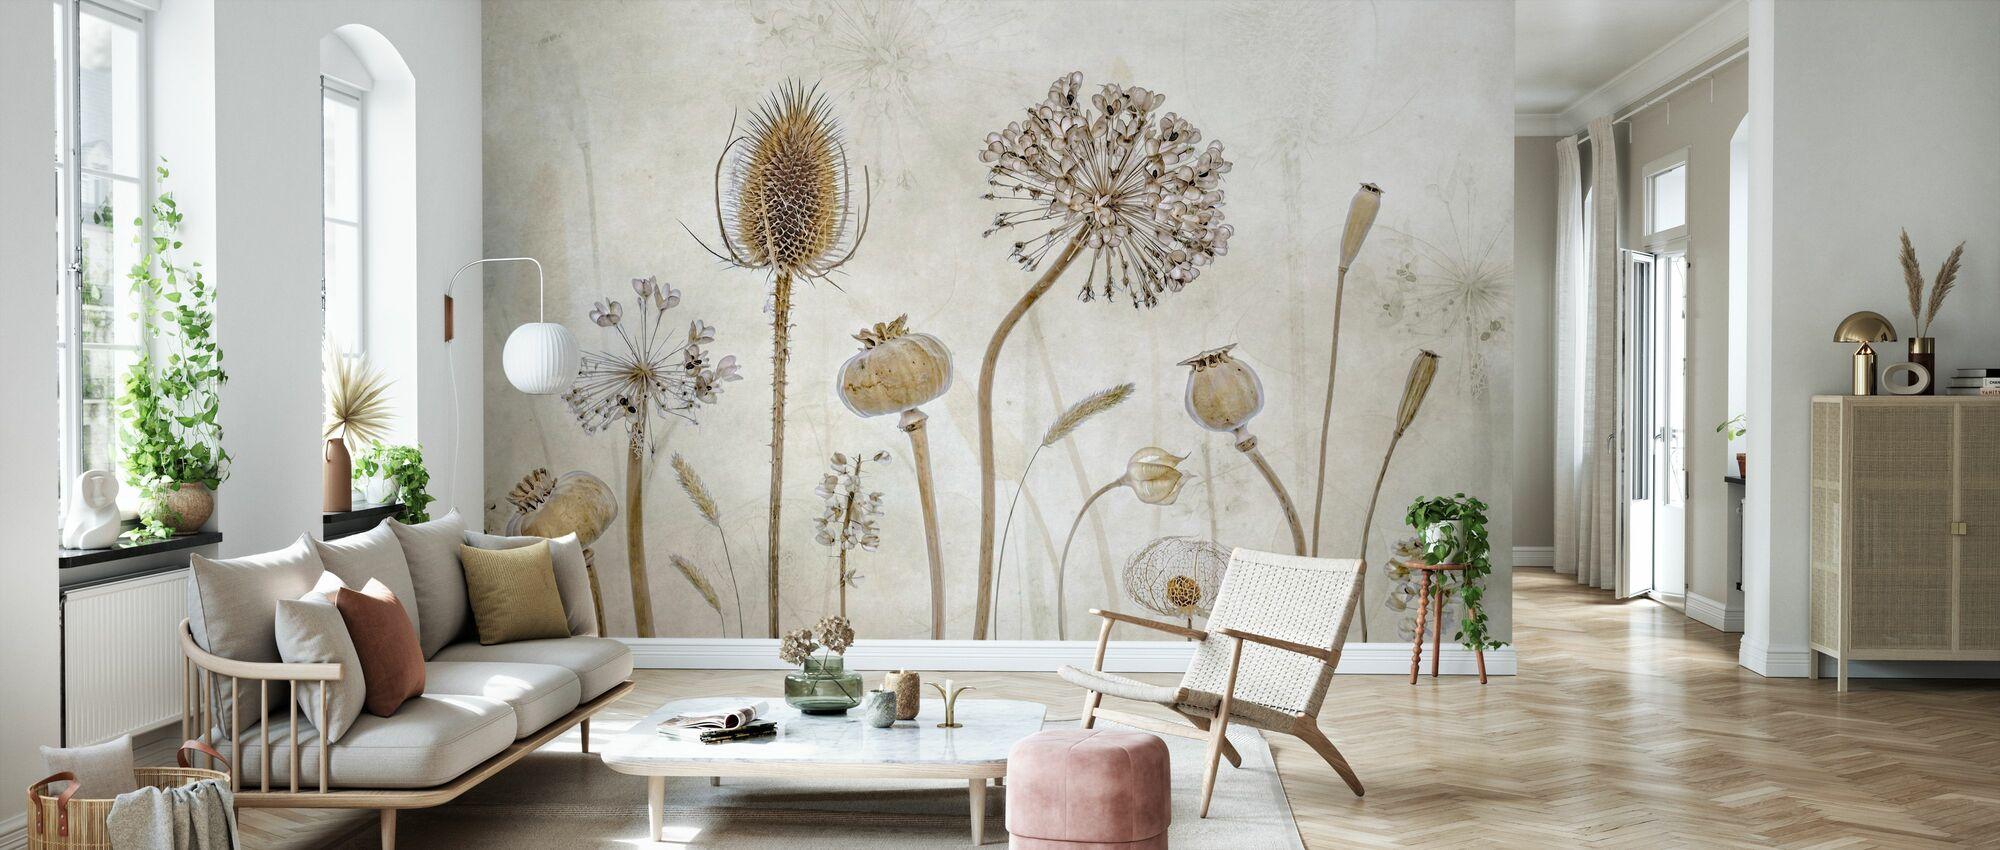 Growing Old - Wallpaper - Living Room